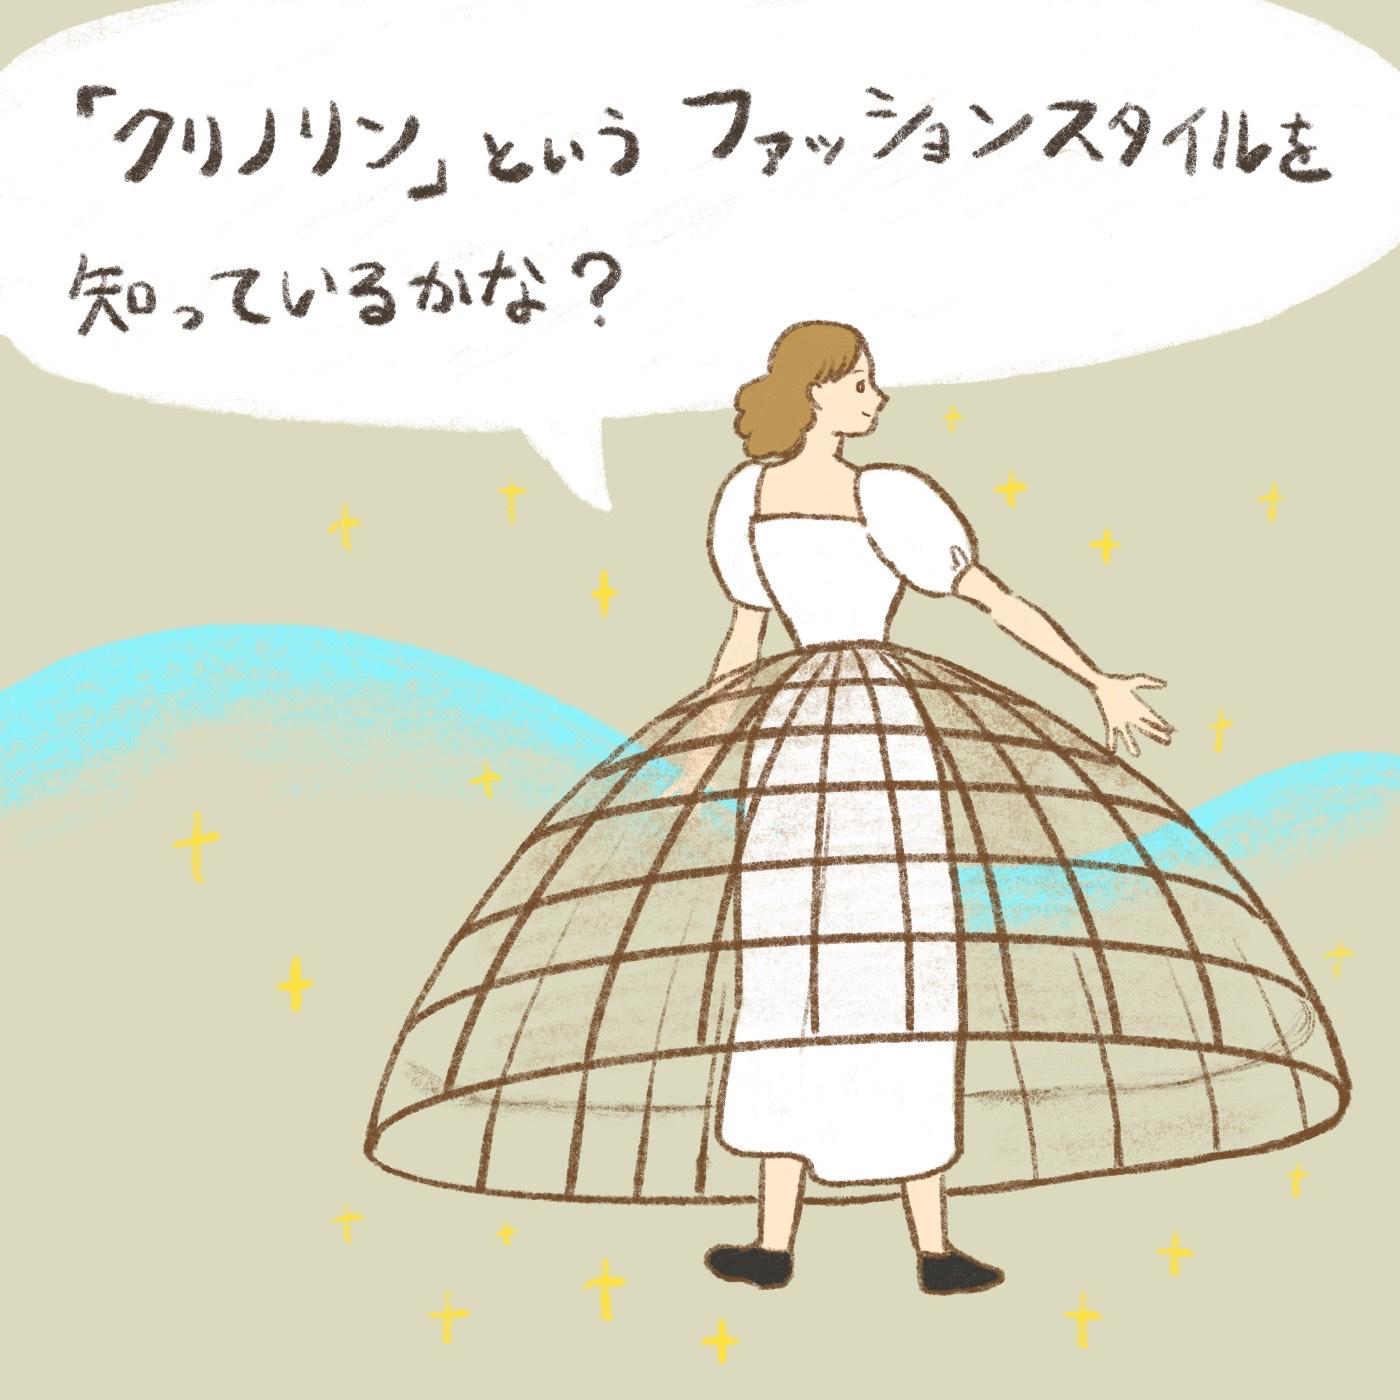 OBIKAKE ナニソレ クリノリン ファッションスタイル